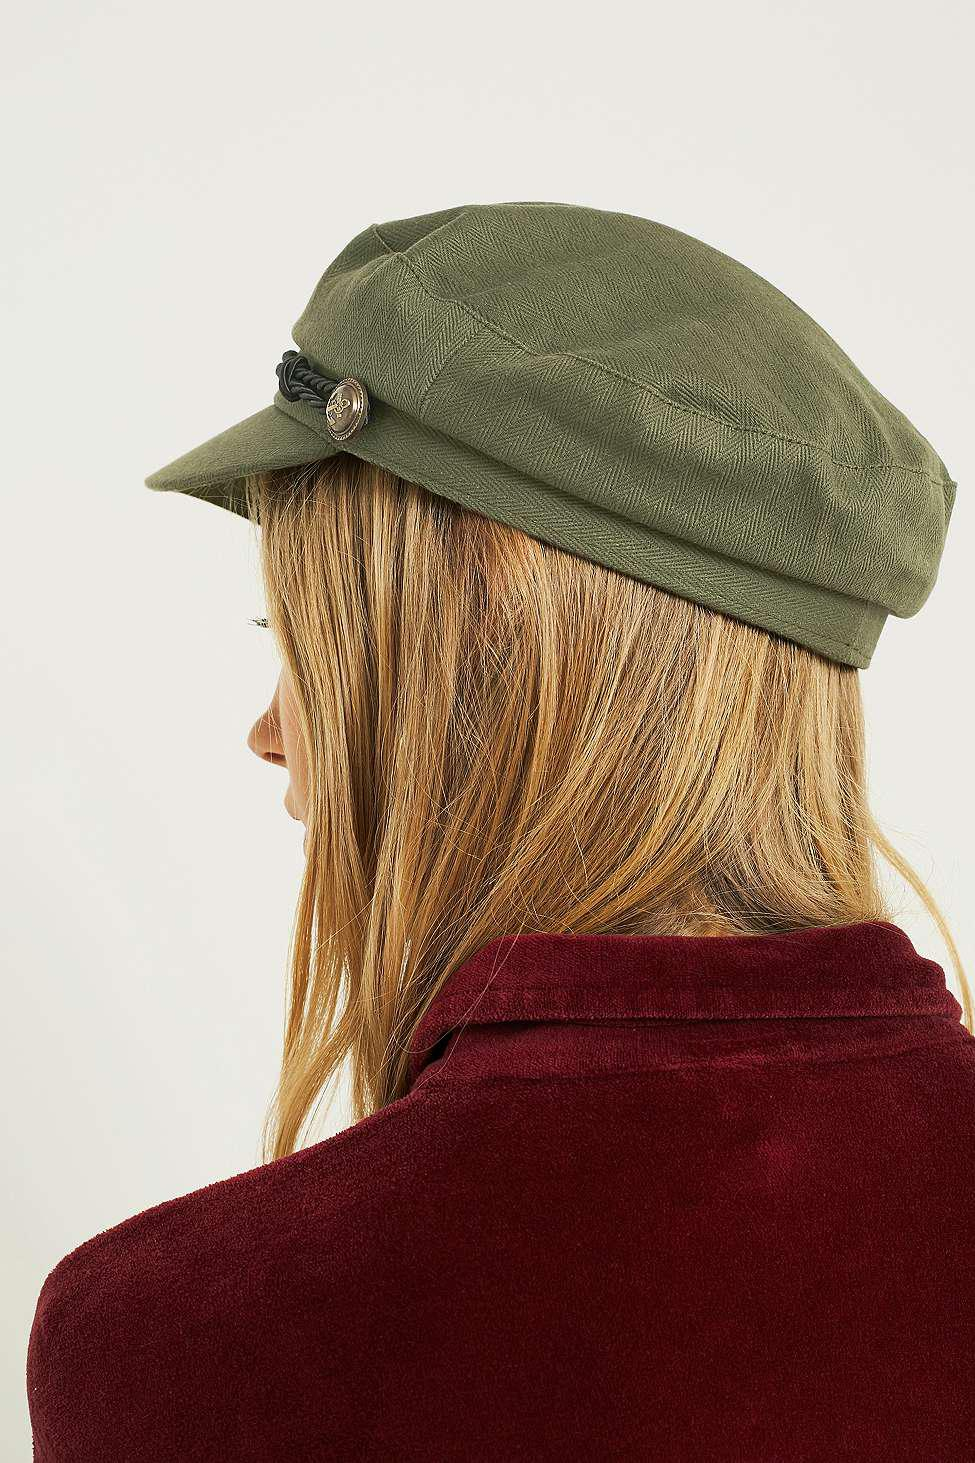 b91394283e85 Urban Outfitters Uo Baker Boy Khaki Cap - Womens All in Green - Lyst